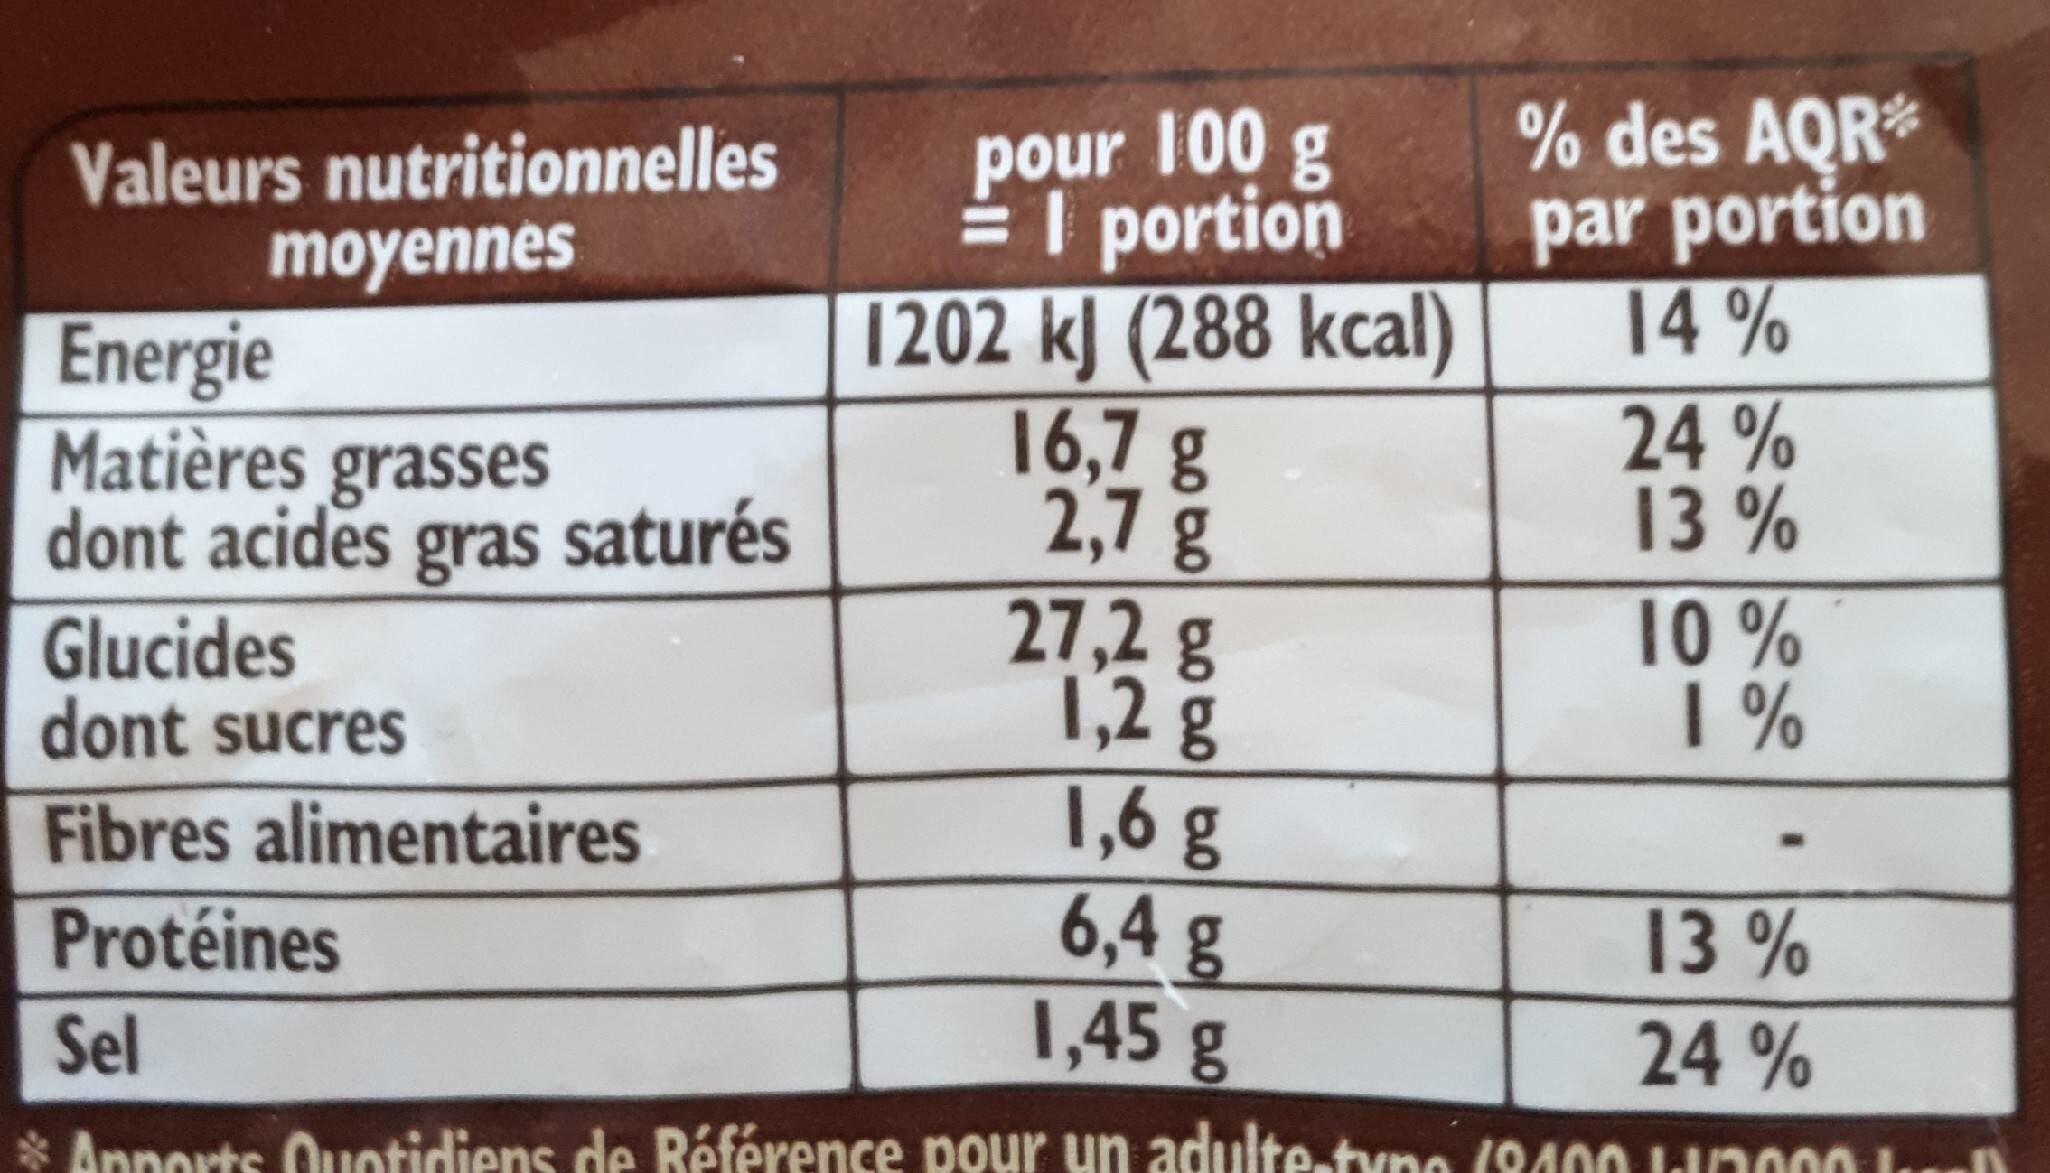 Pommes dauphines - Informations nutritionnelles - fr